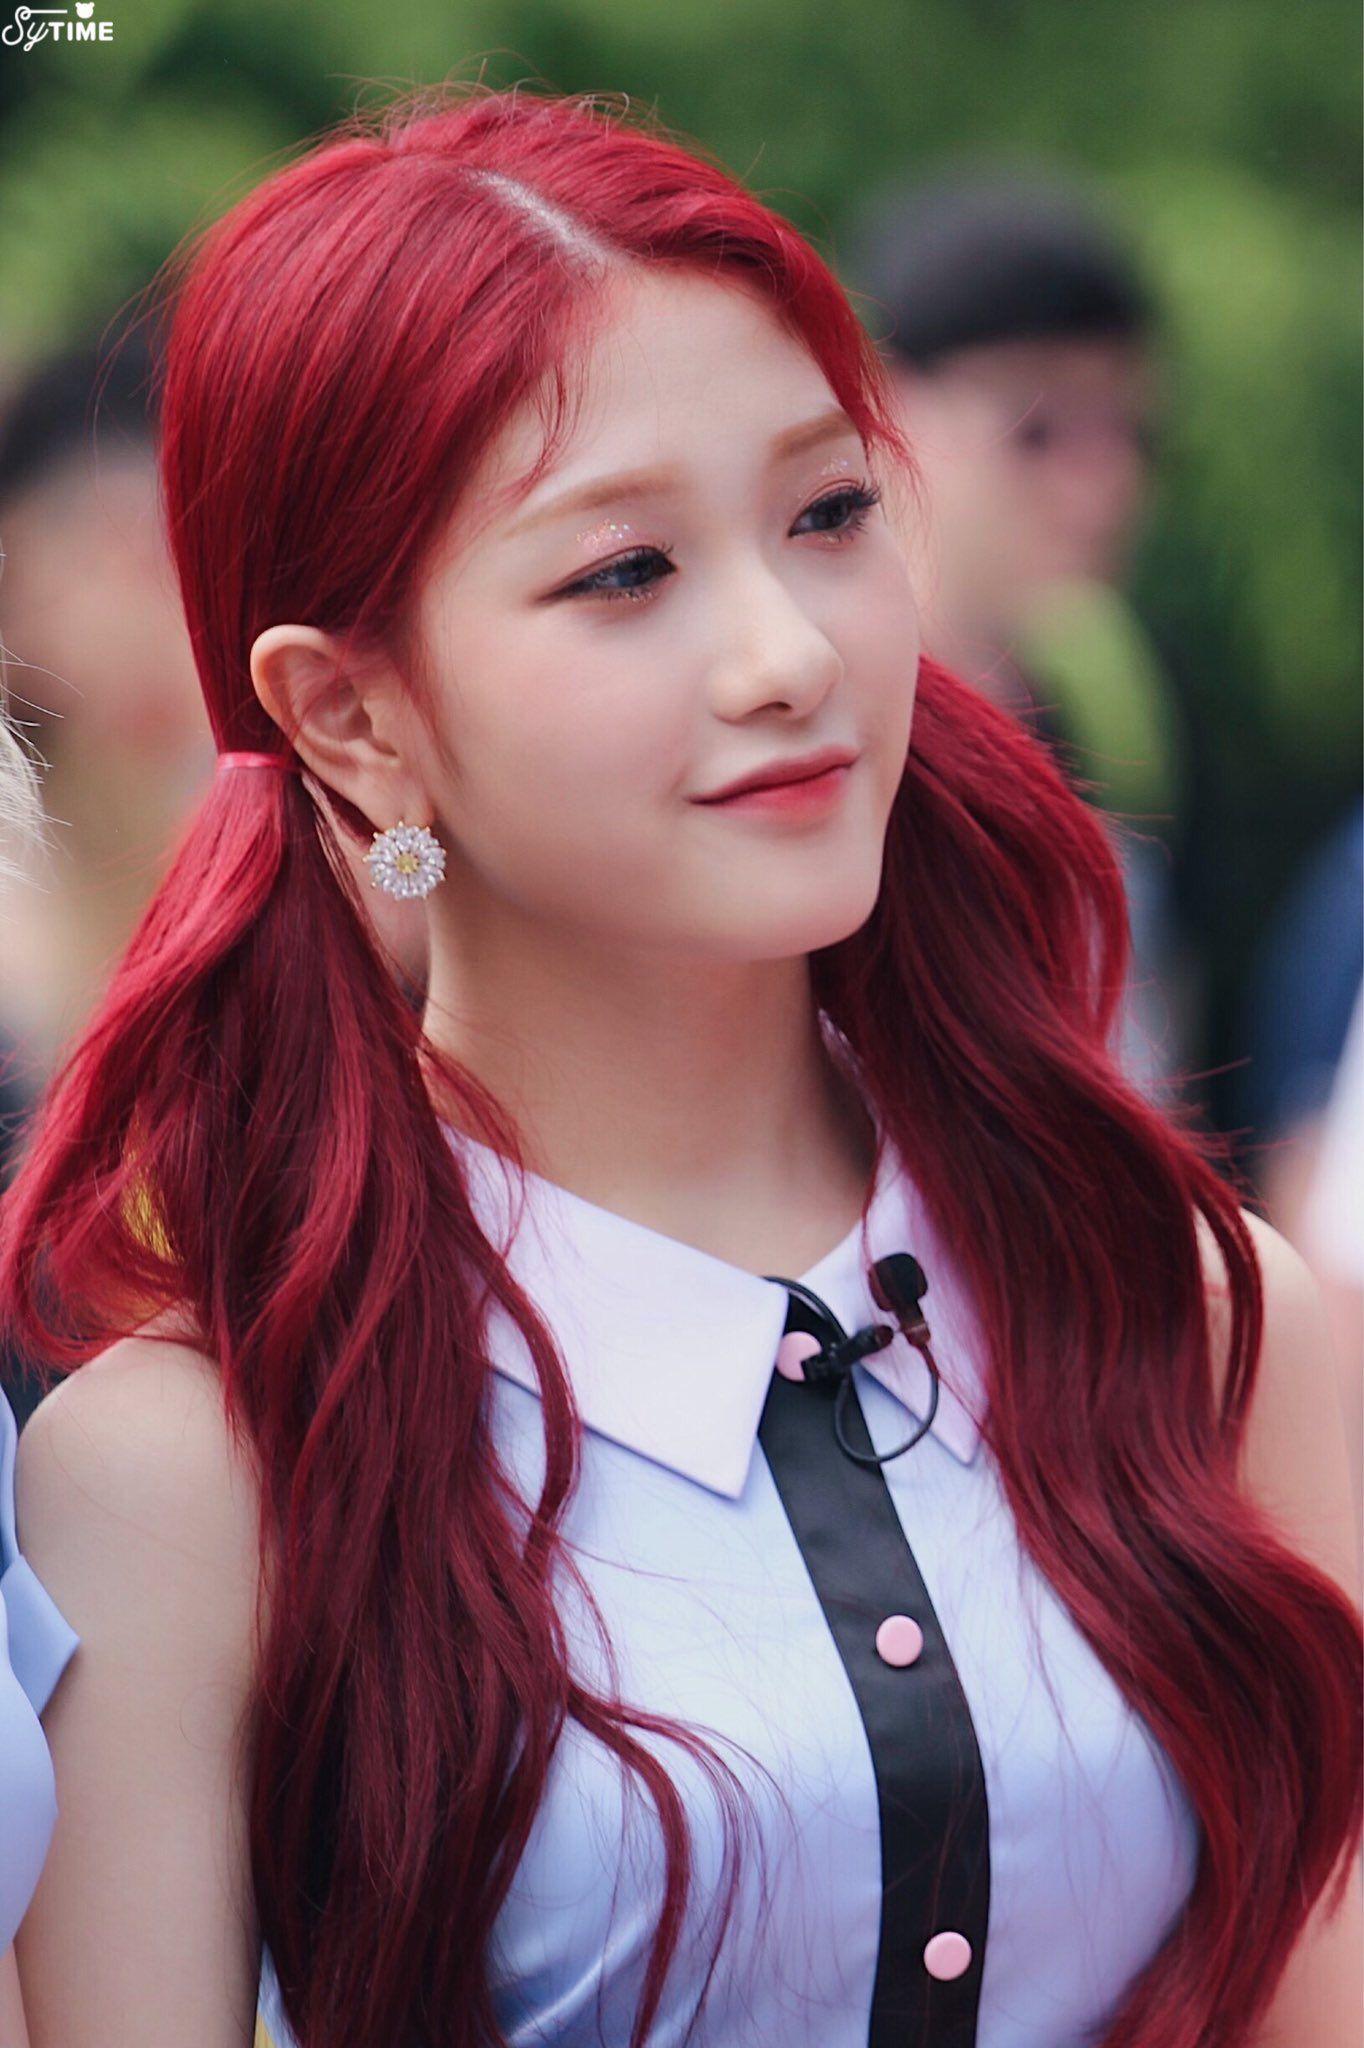 Seoyeon Kpop Kdrama Bts Exo Kpoparmy Red Hair Kpop Girl Hair Colors Kpop Hair